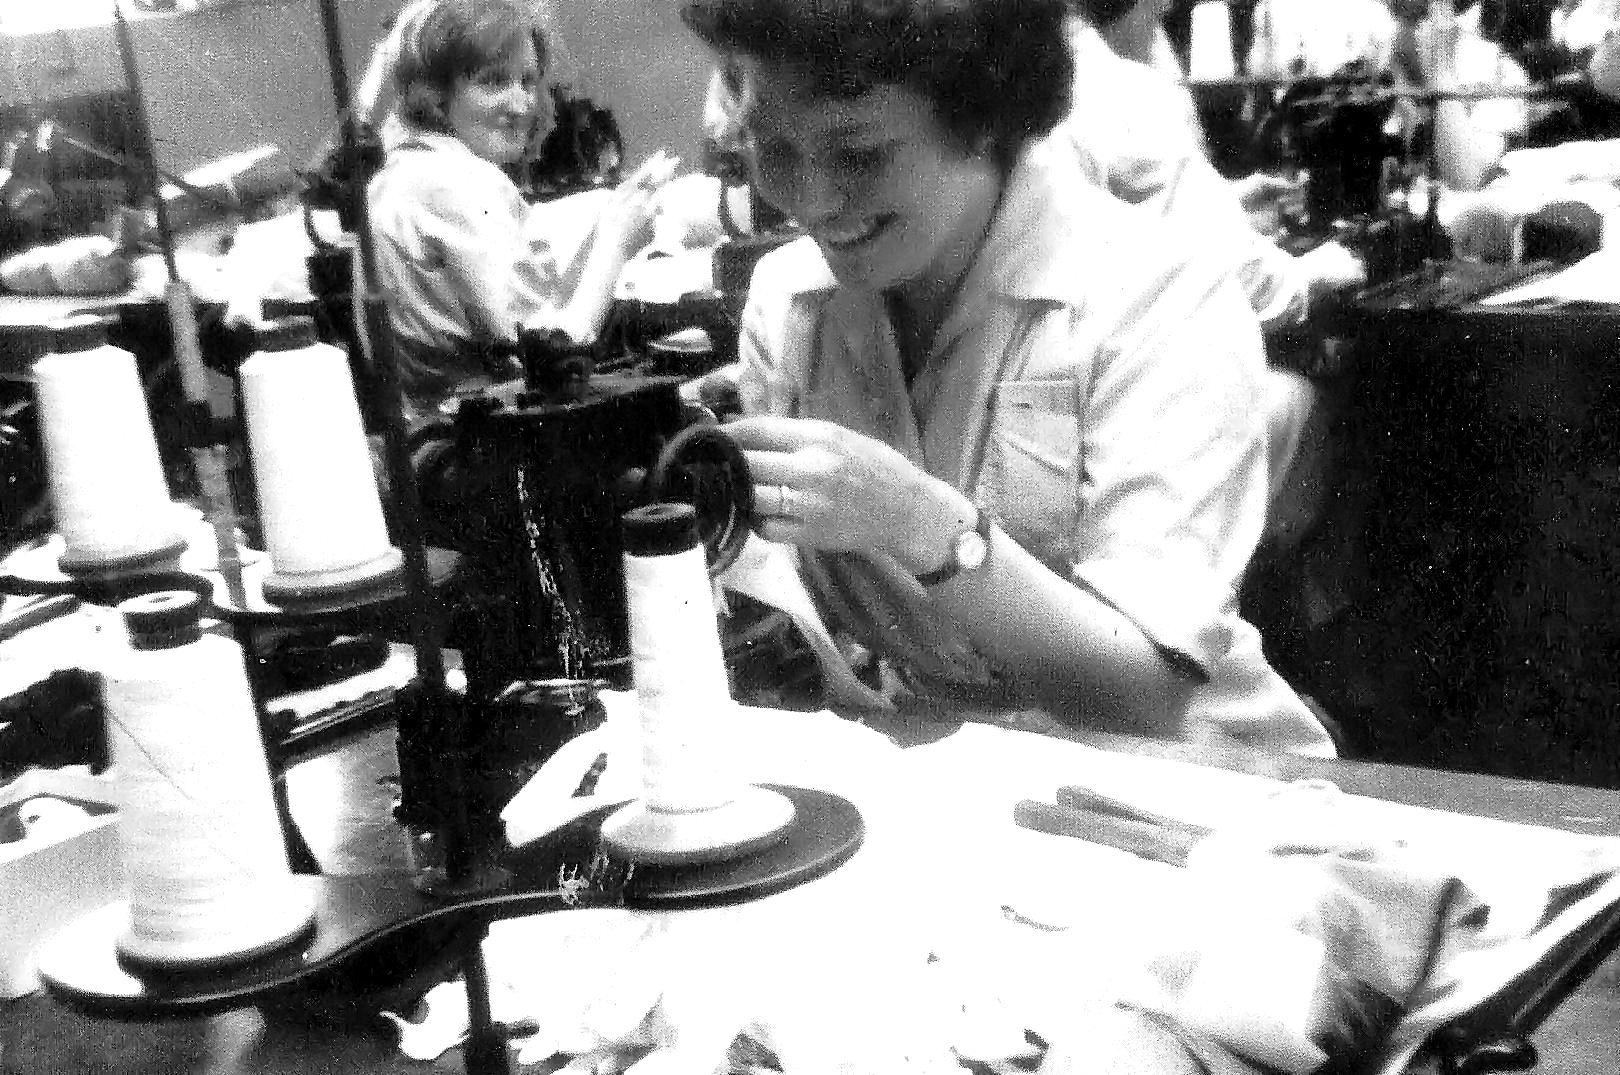 18. Pinkhams Glove Factory 1959